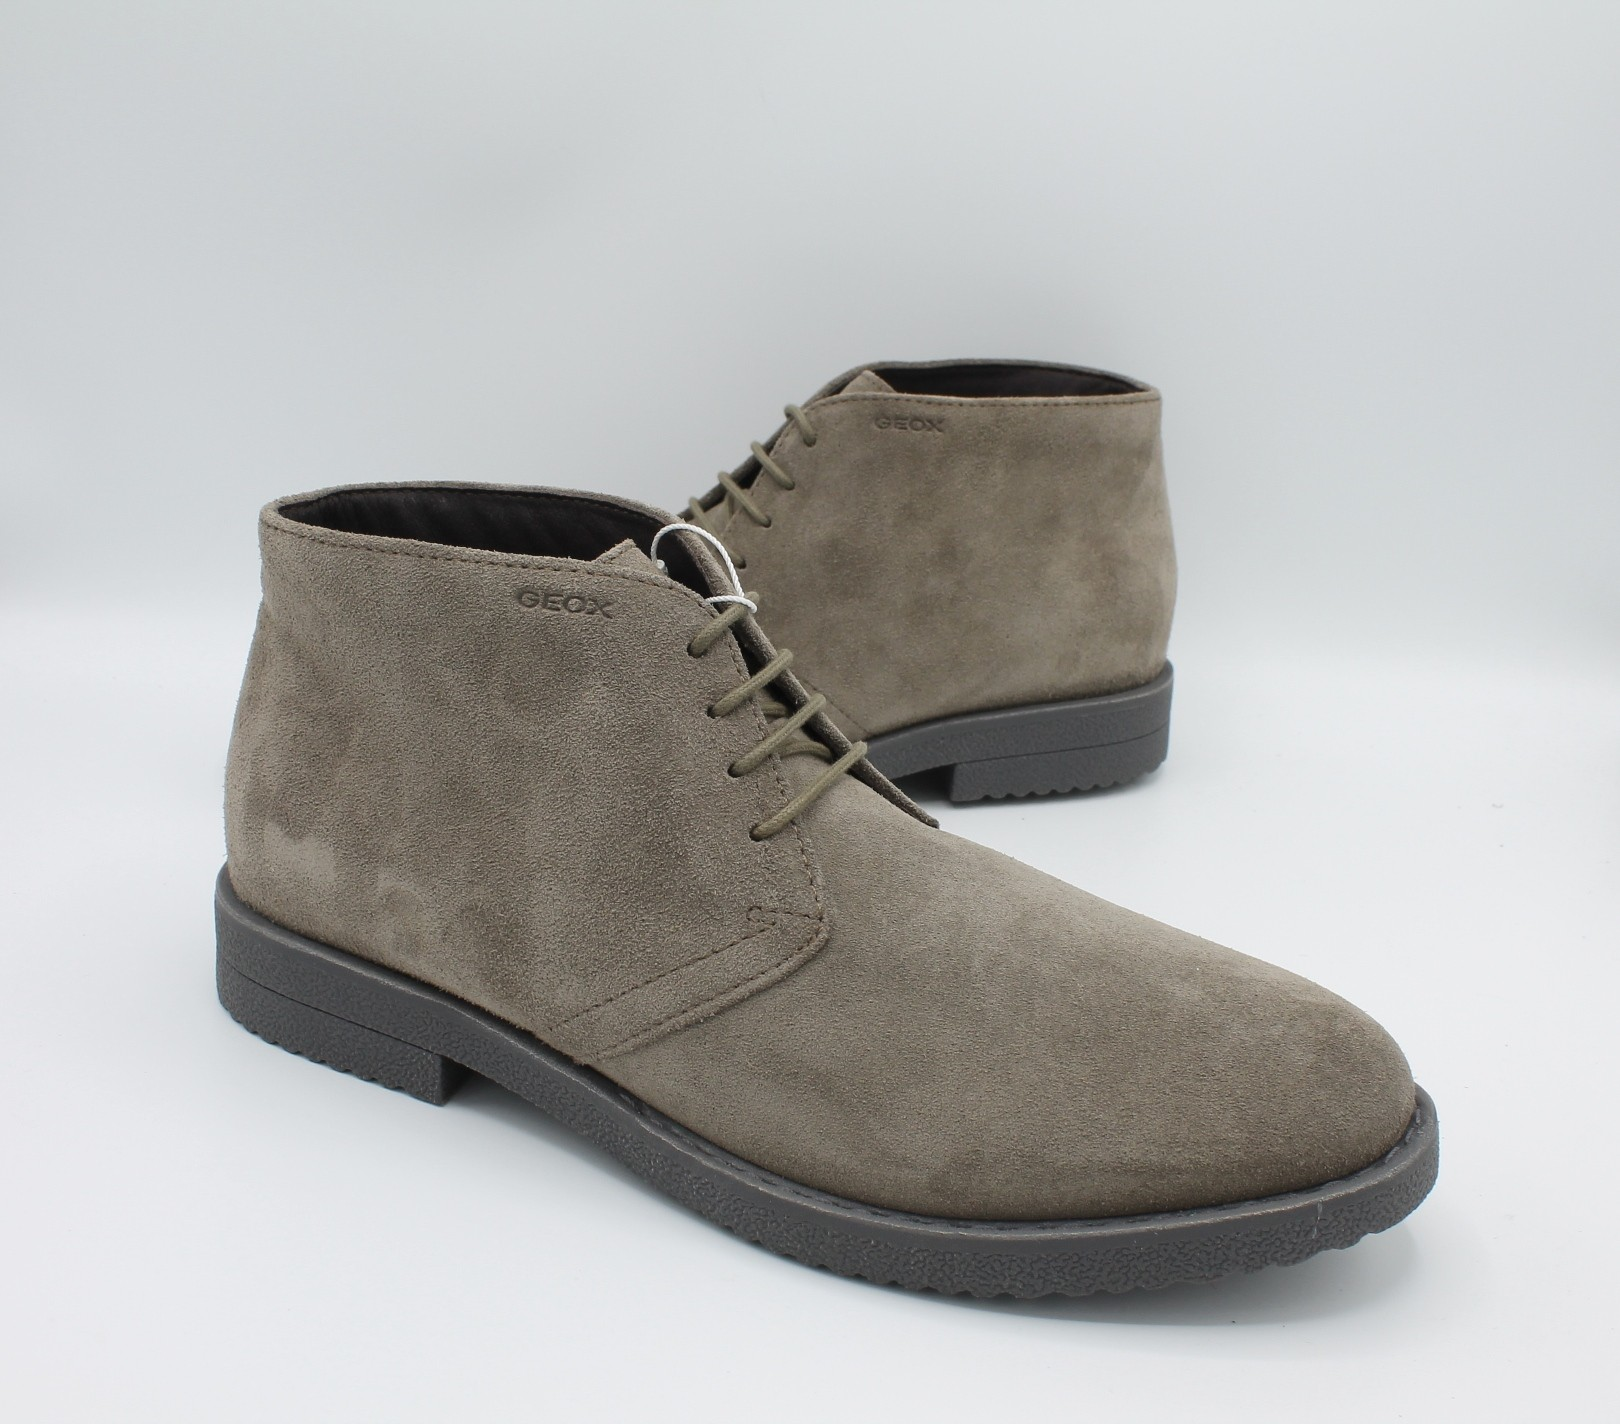 Geox scarpe uomo polacchine in camoscio Taupe U843MB Bradled Angela Barba